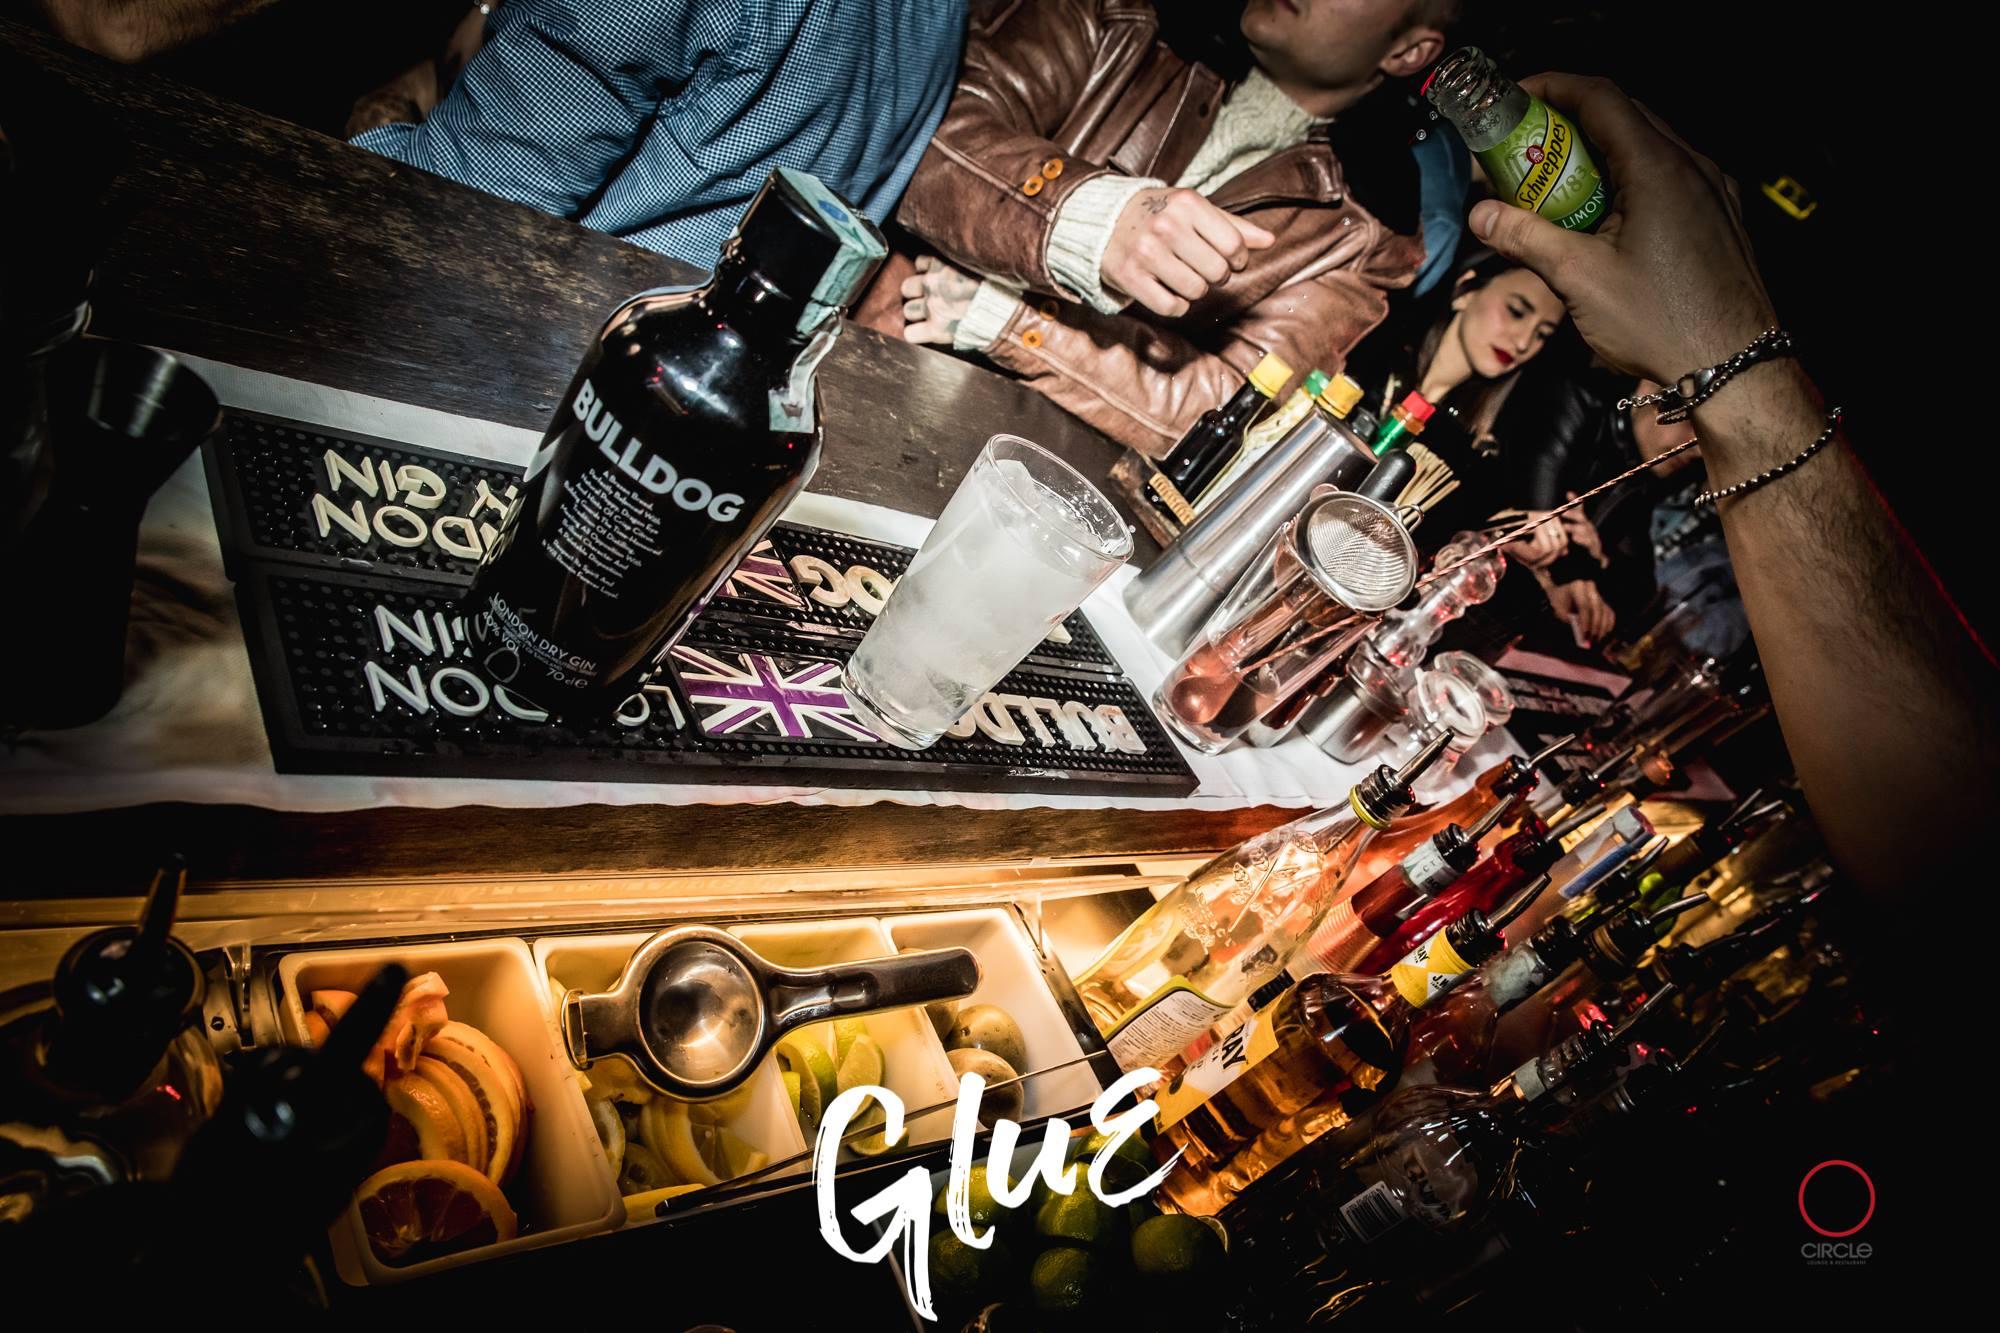 BULLDOG OFFICIAL PARTY   YOUparti circle milano free gratis friday venerdì gin